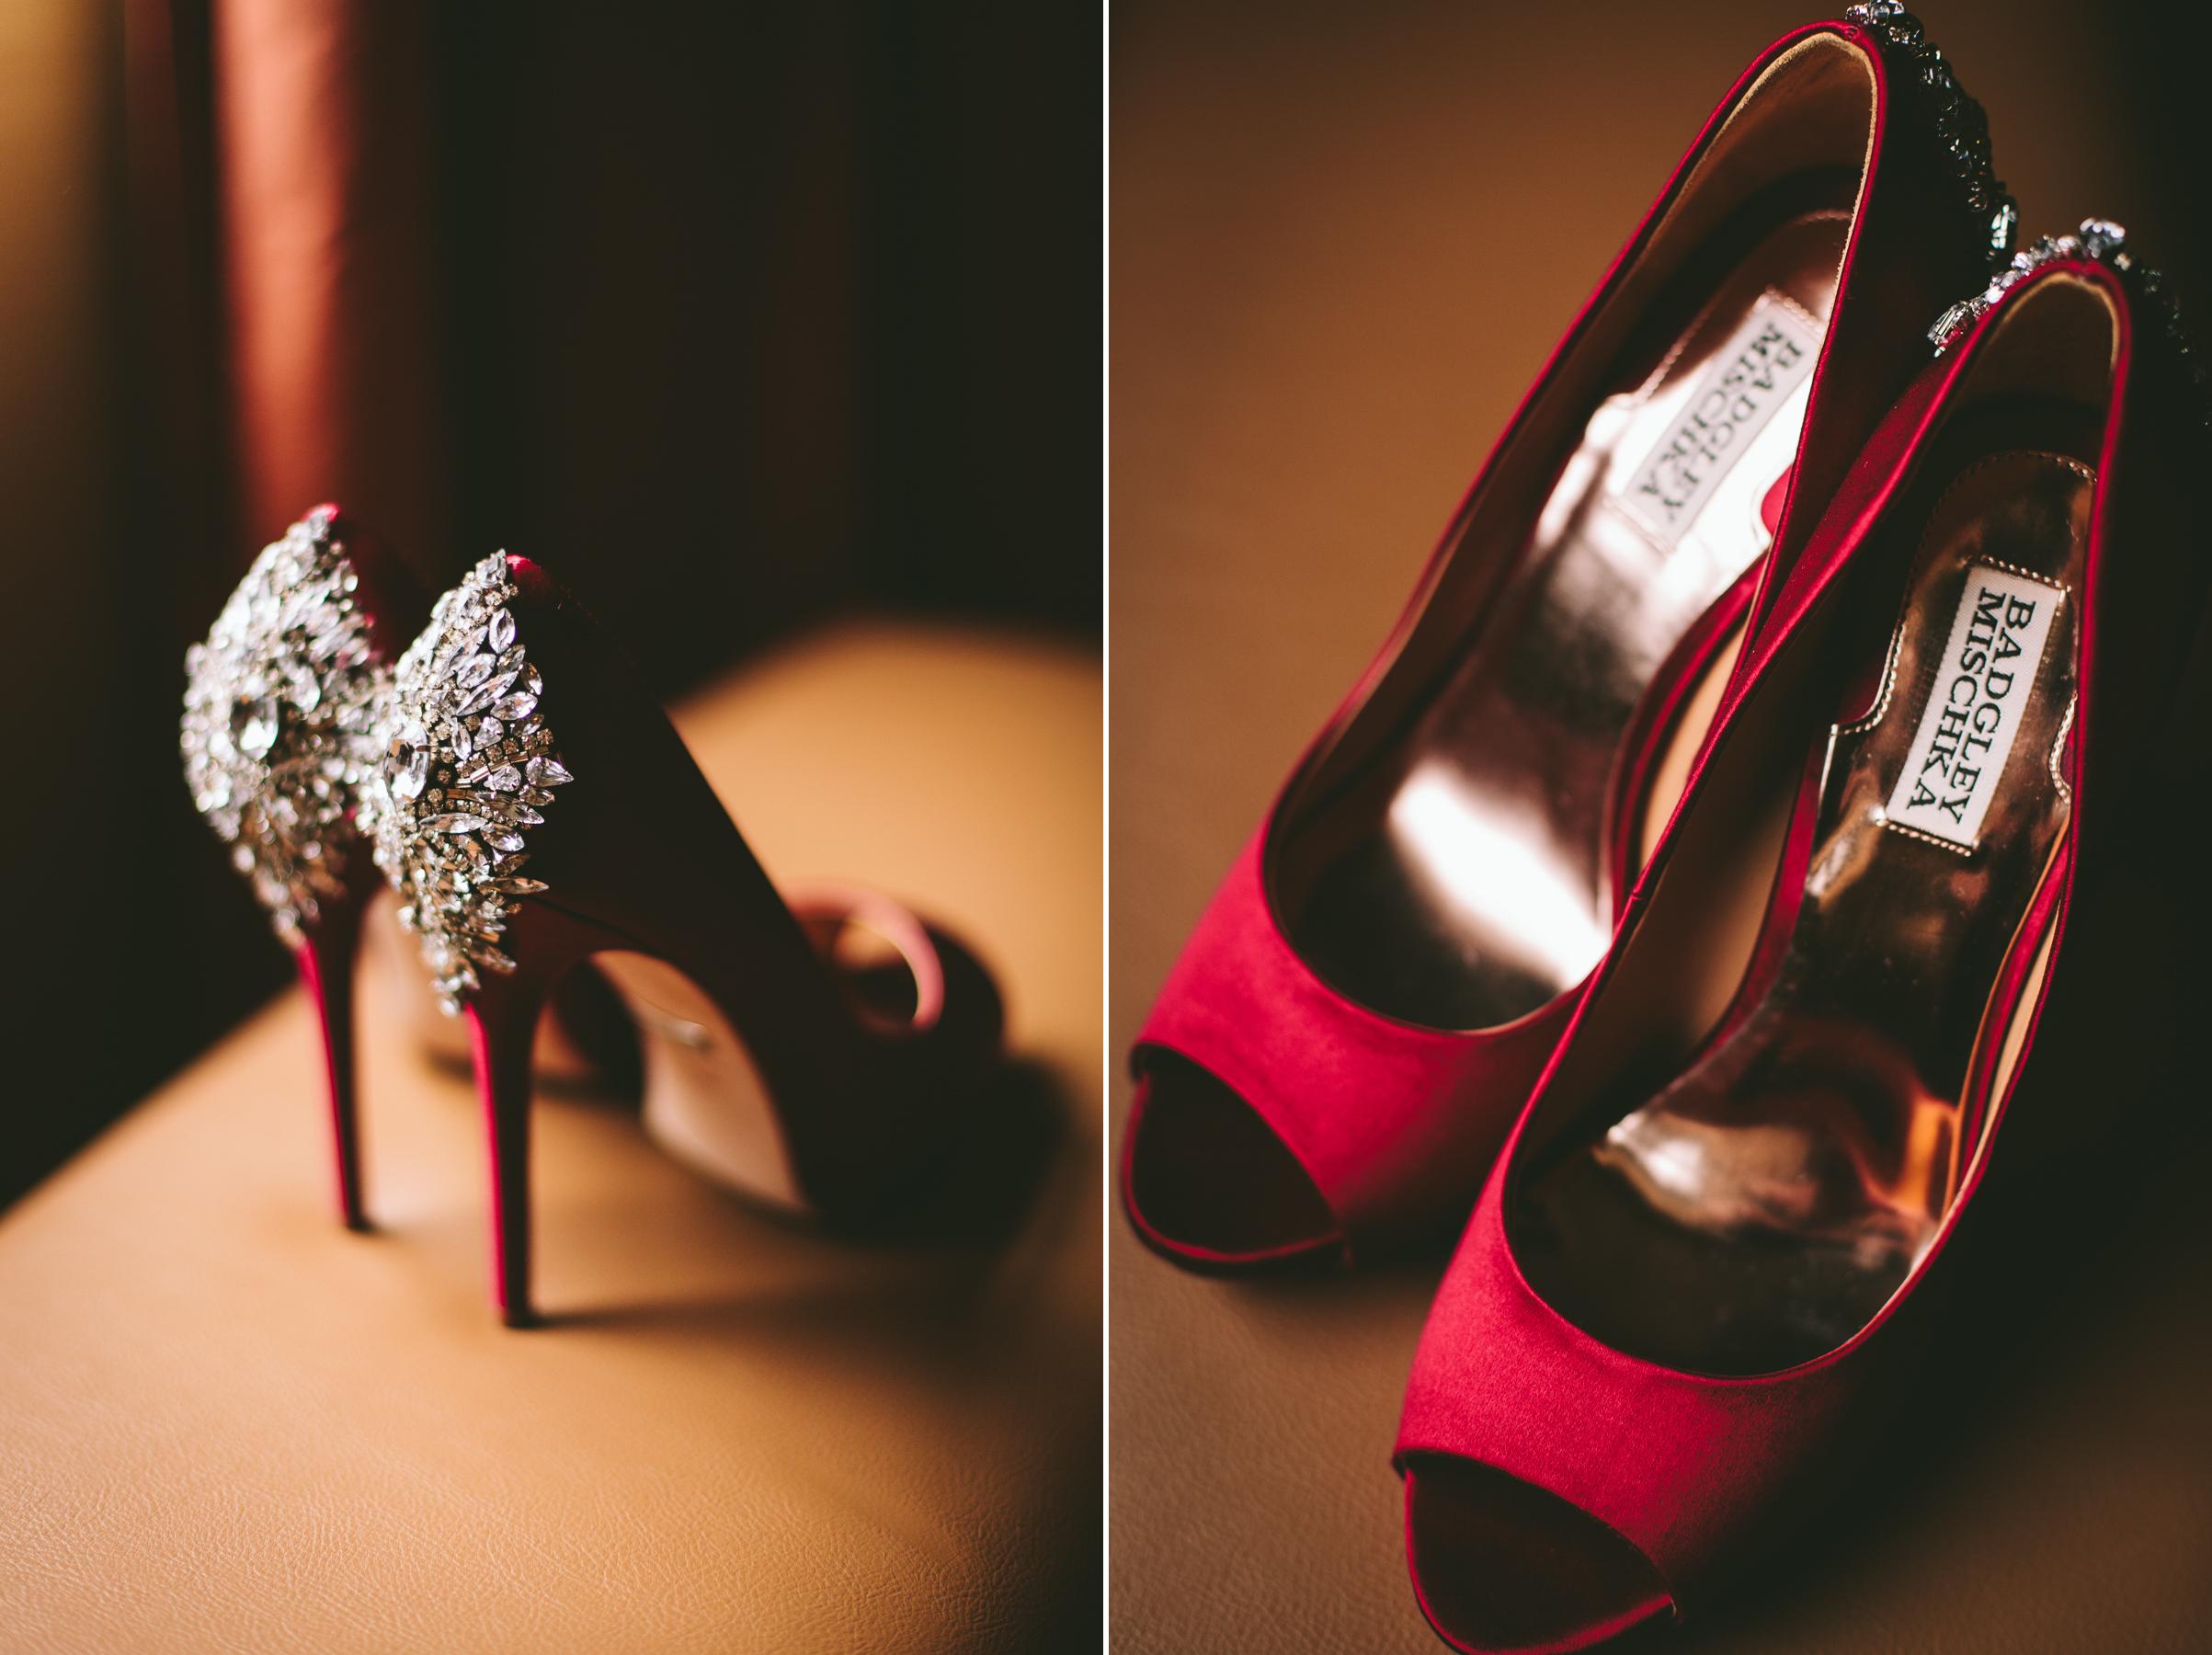 badgley mischka shoes diptic.jpg